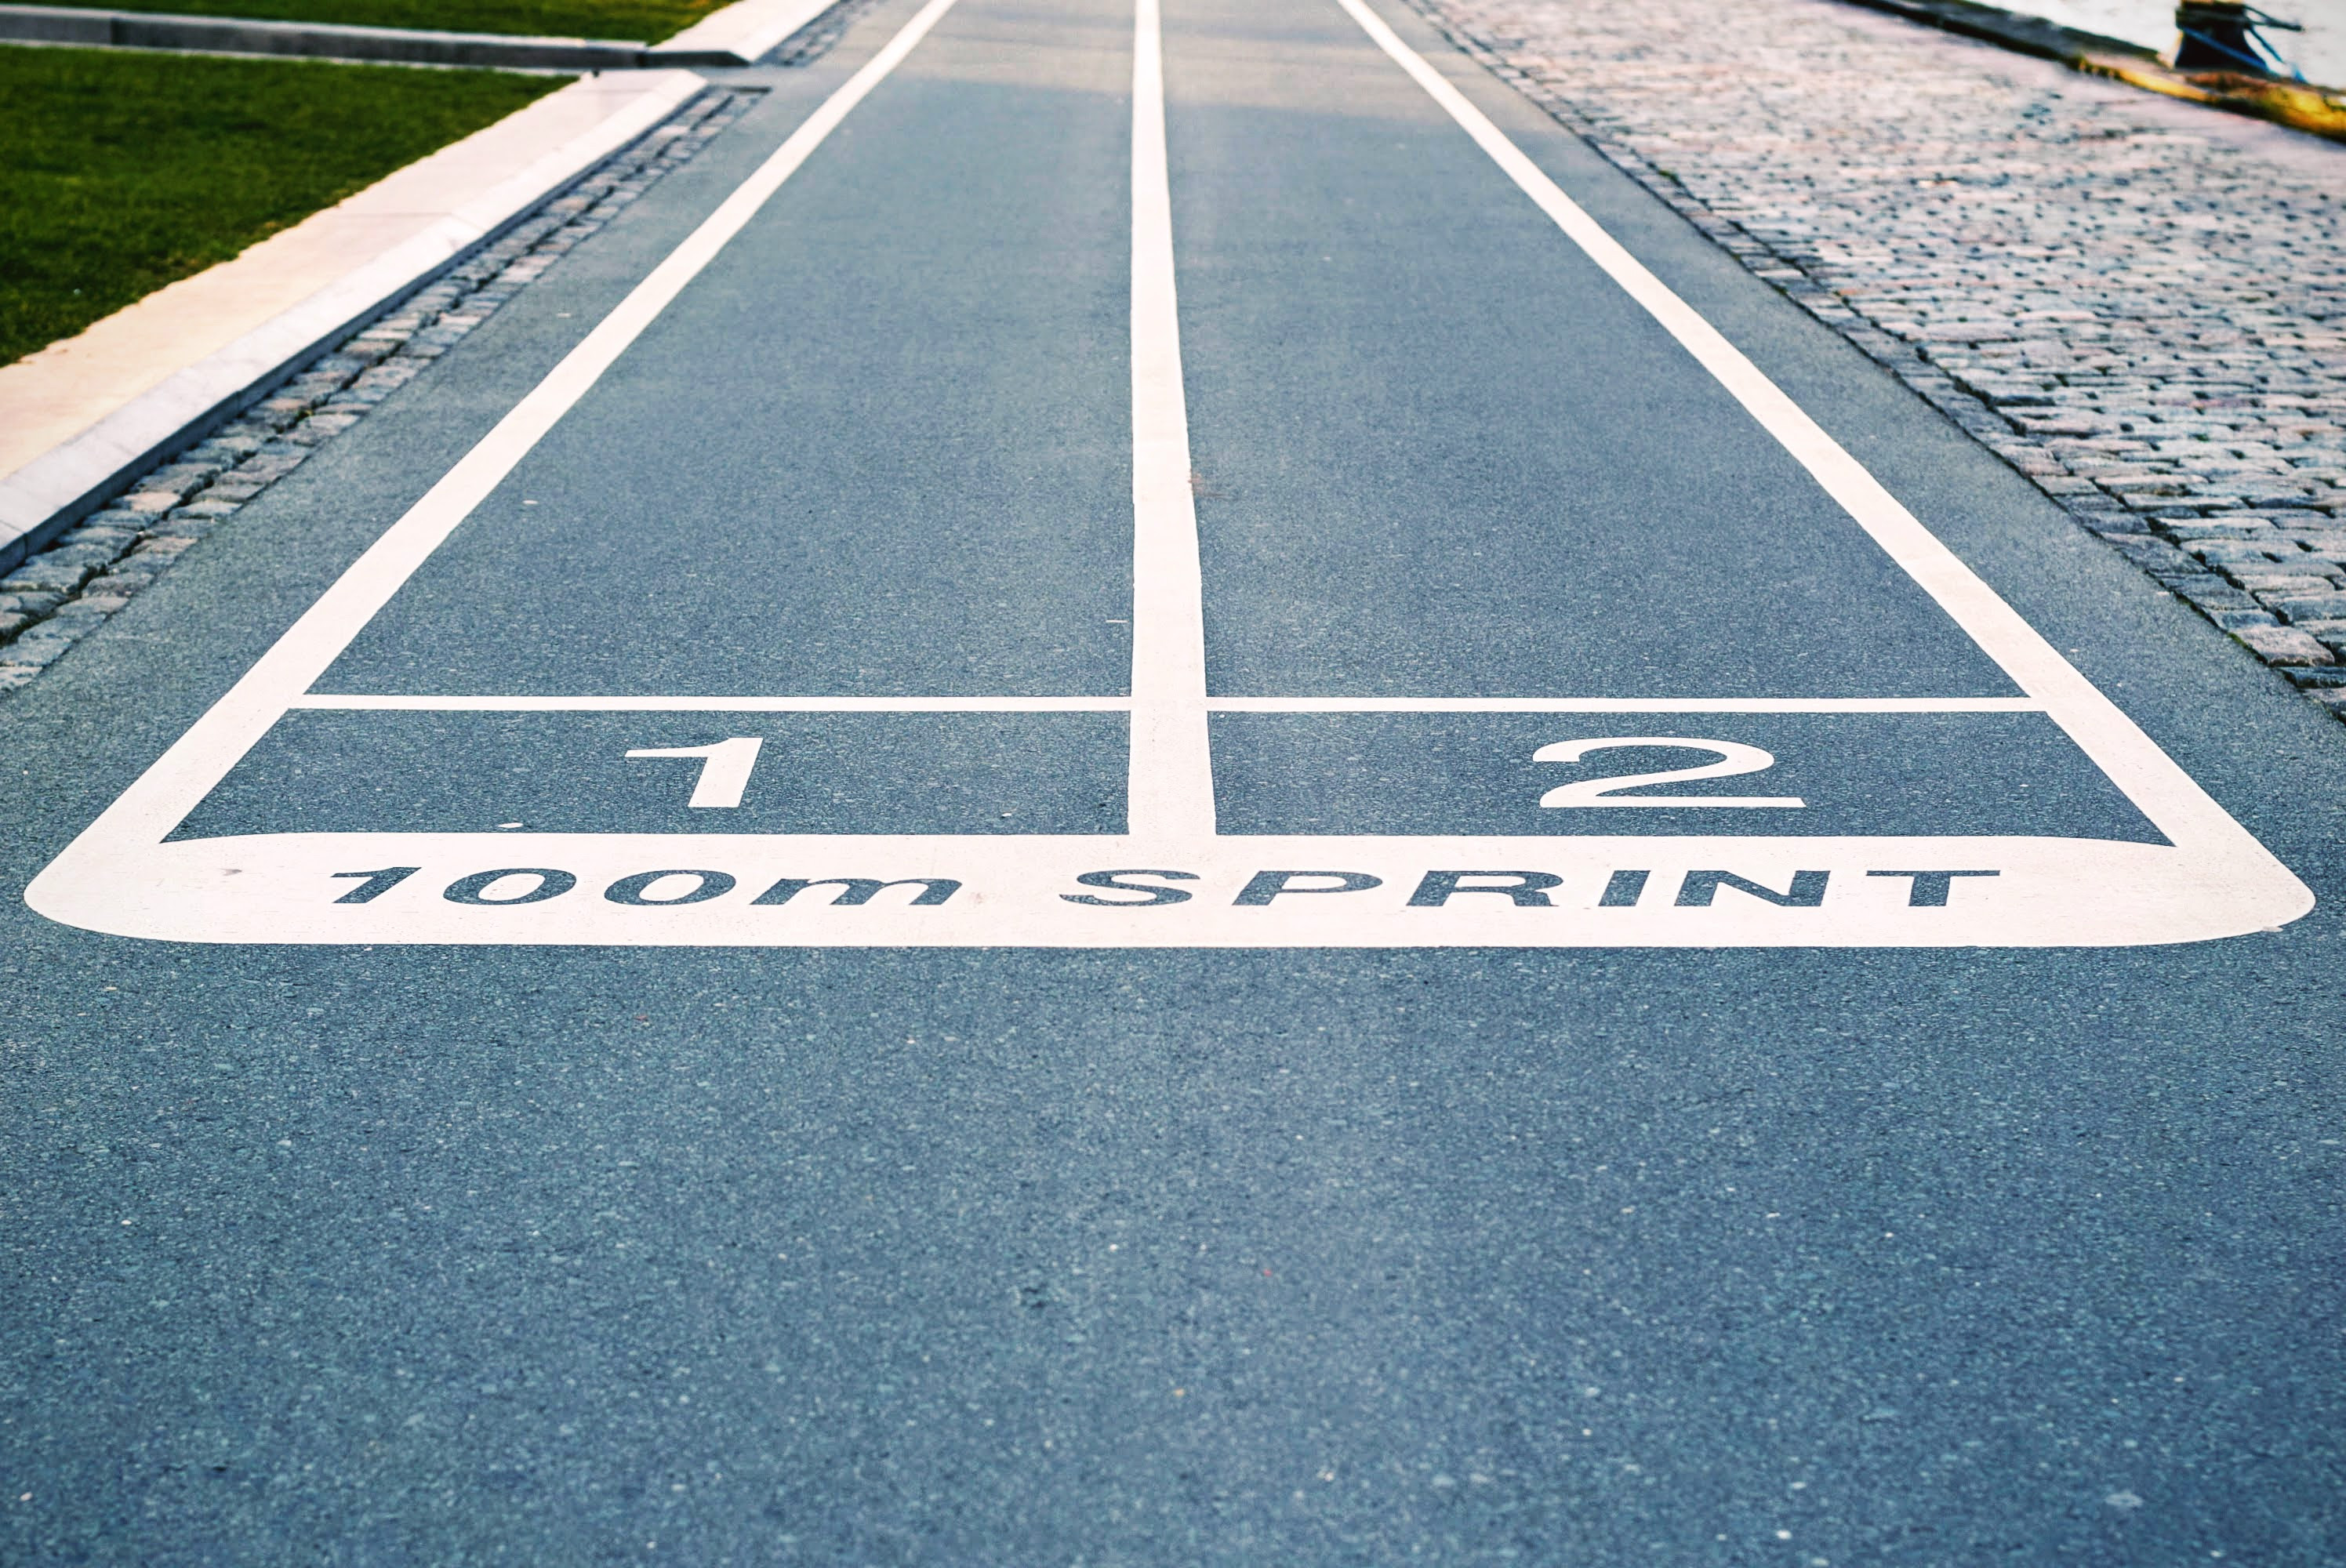 Frissítési terv sportolóknak